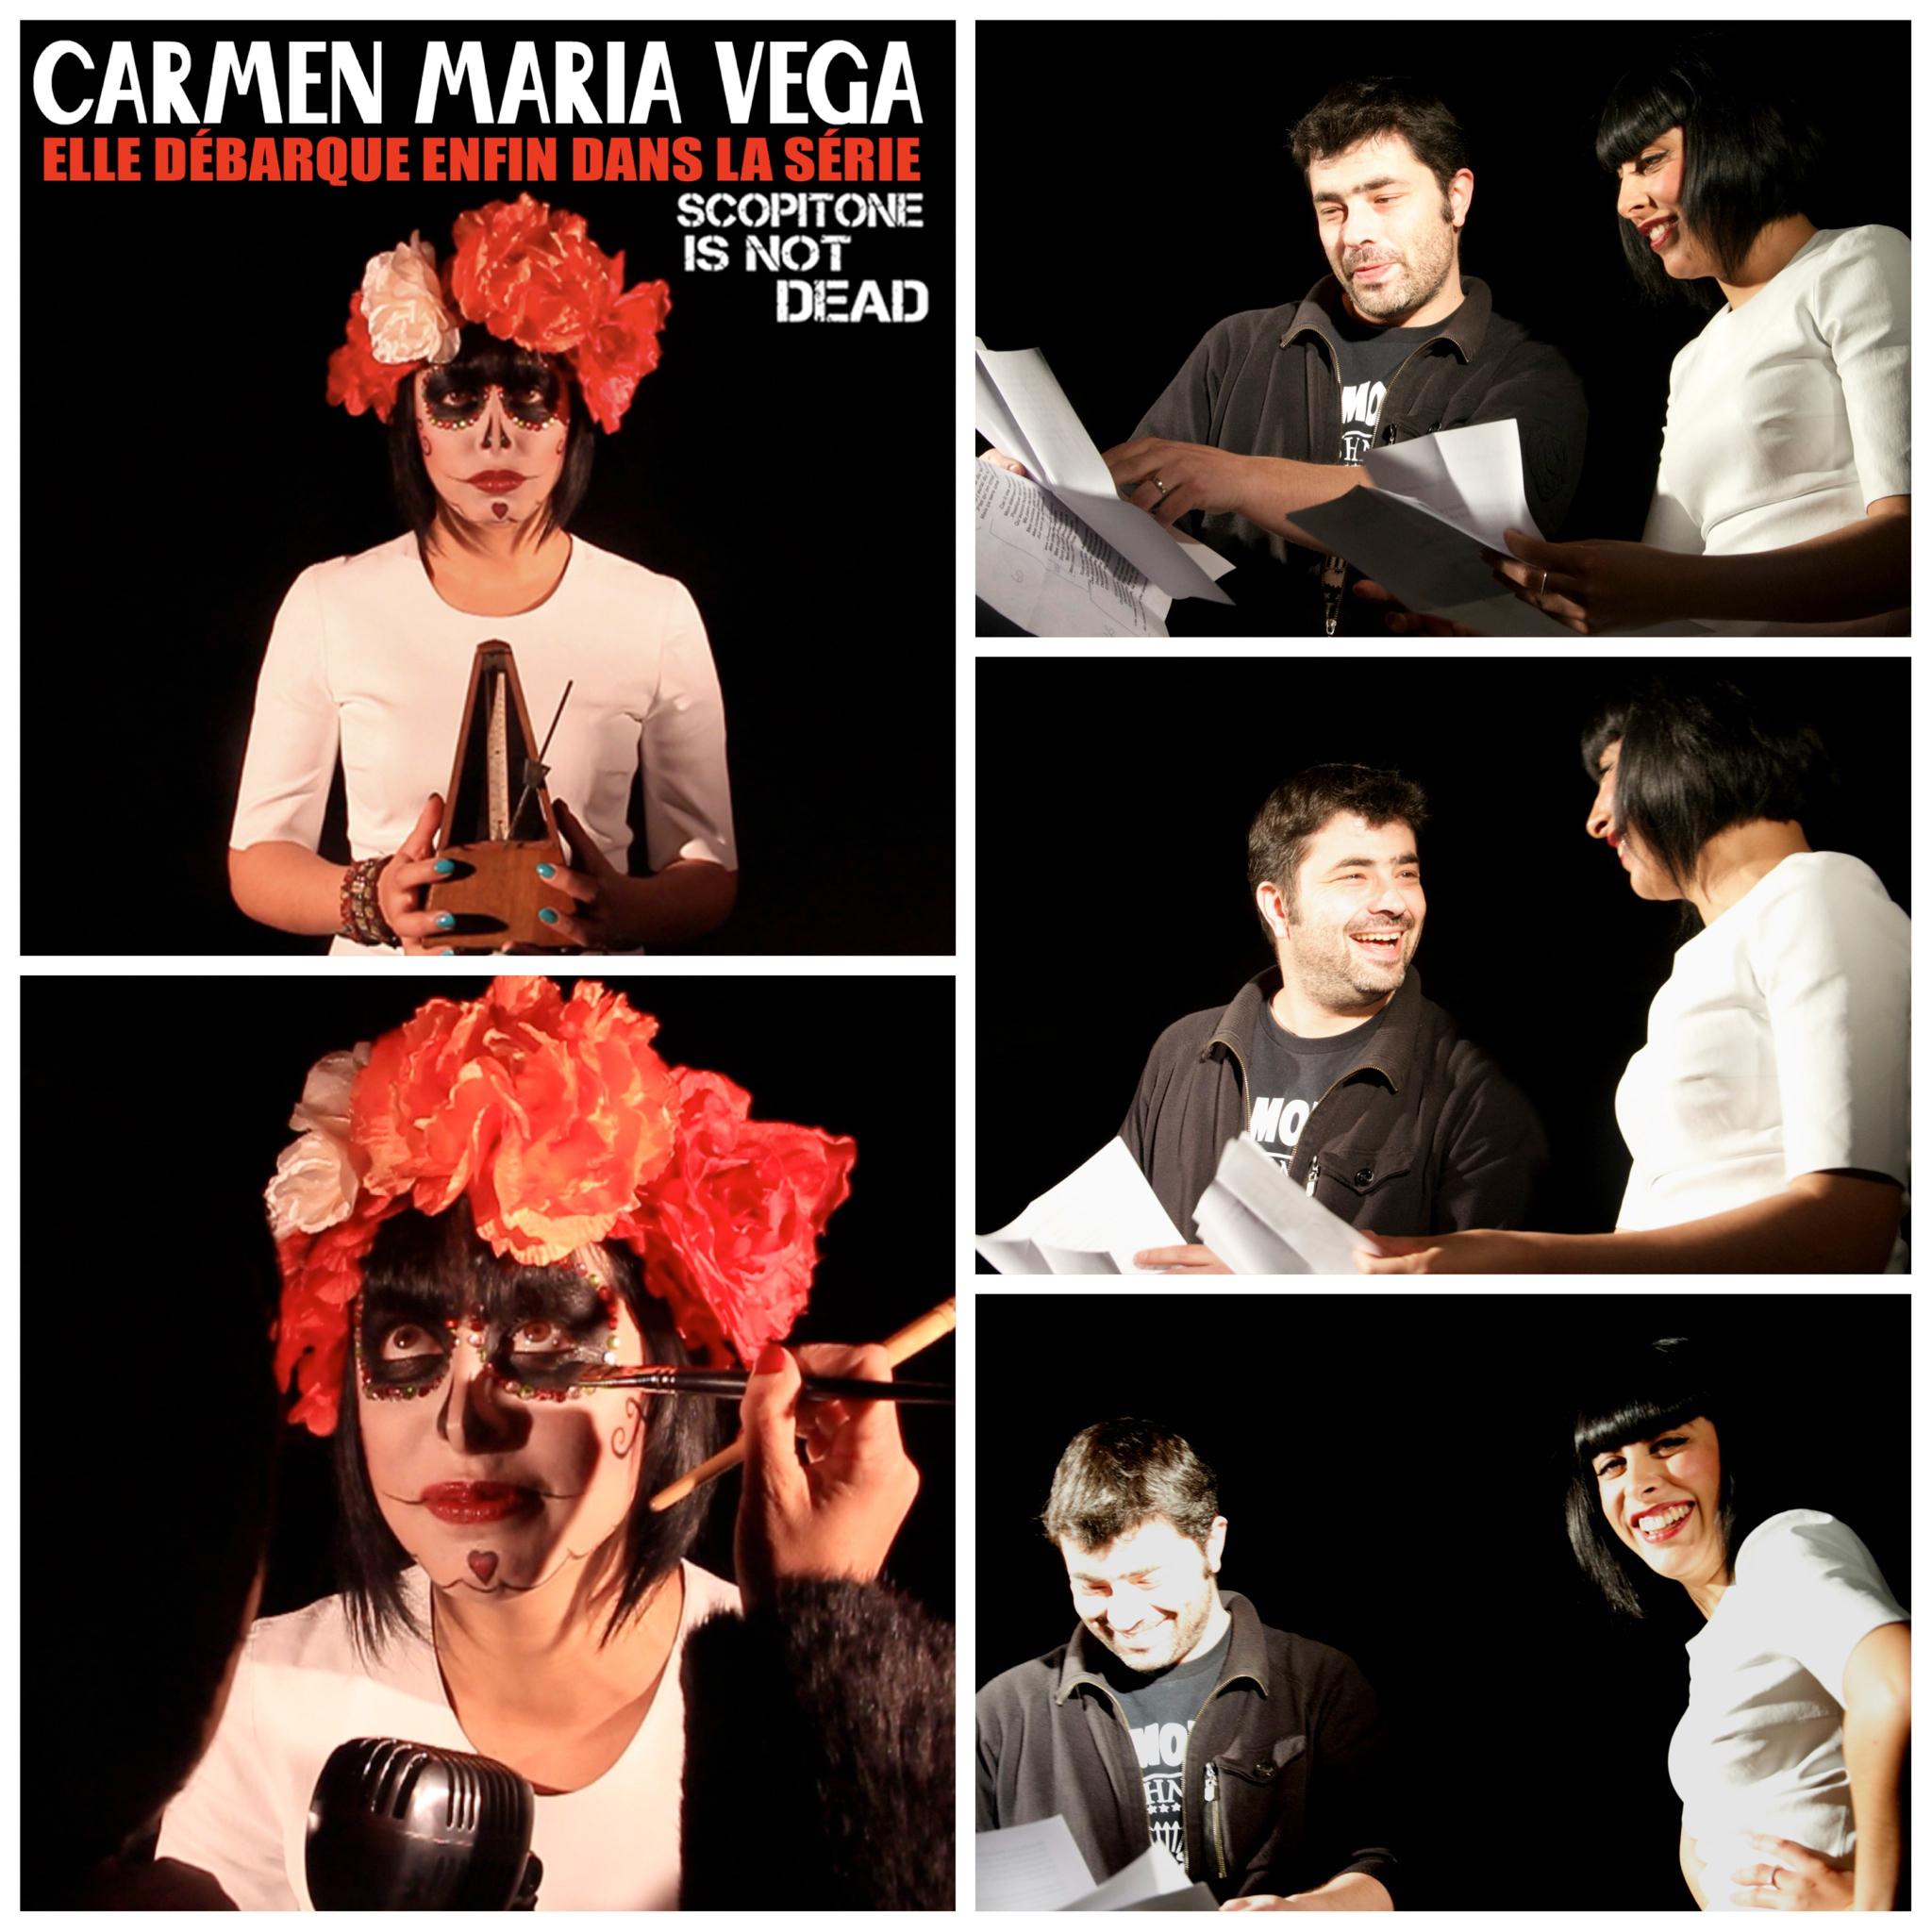 Tournage scopitone avec CARMEN MARIA VEG